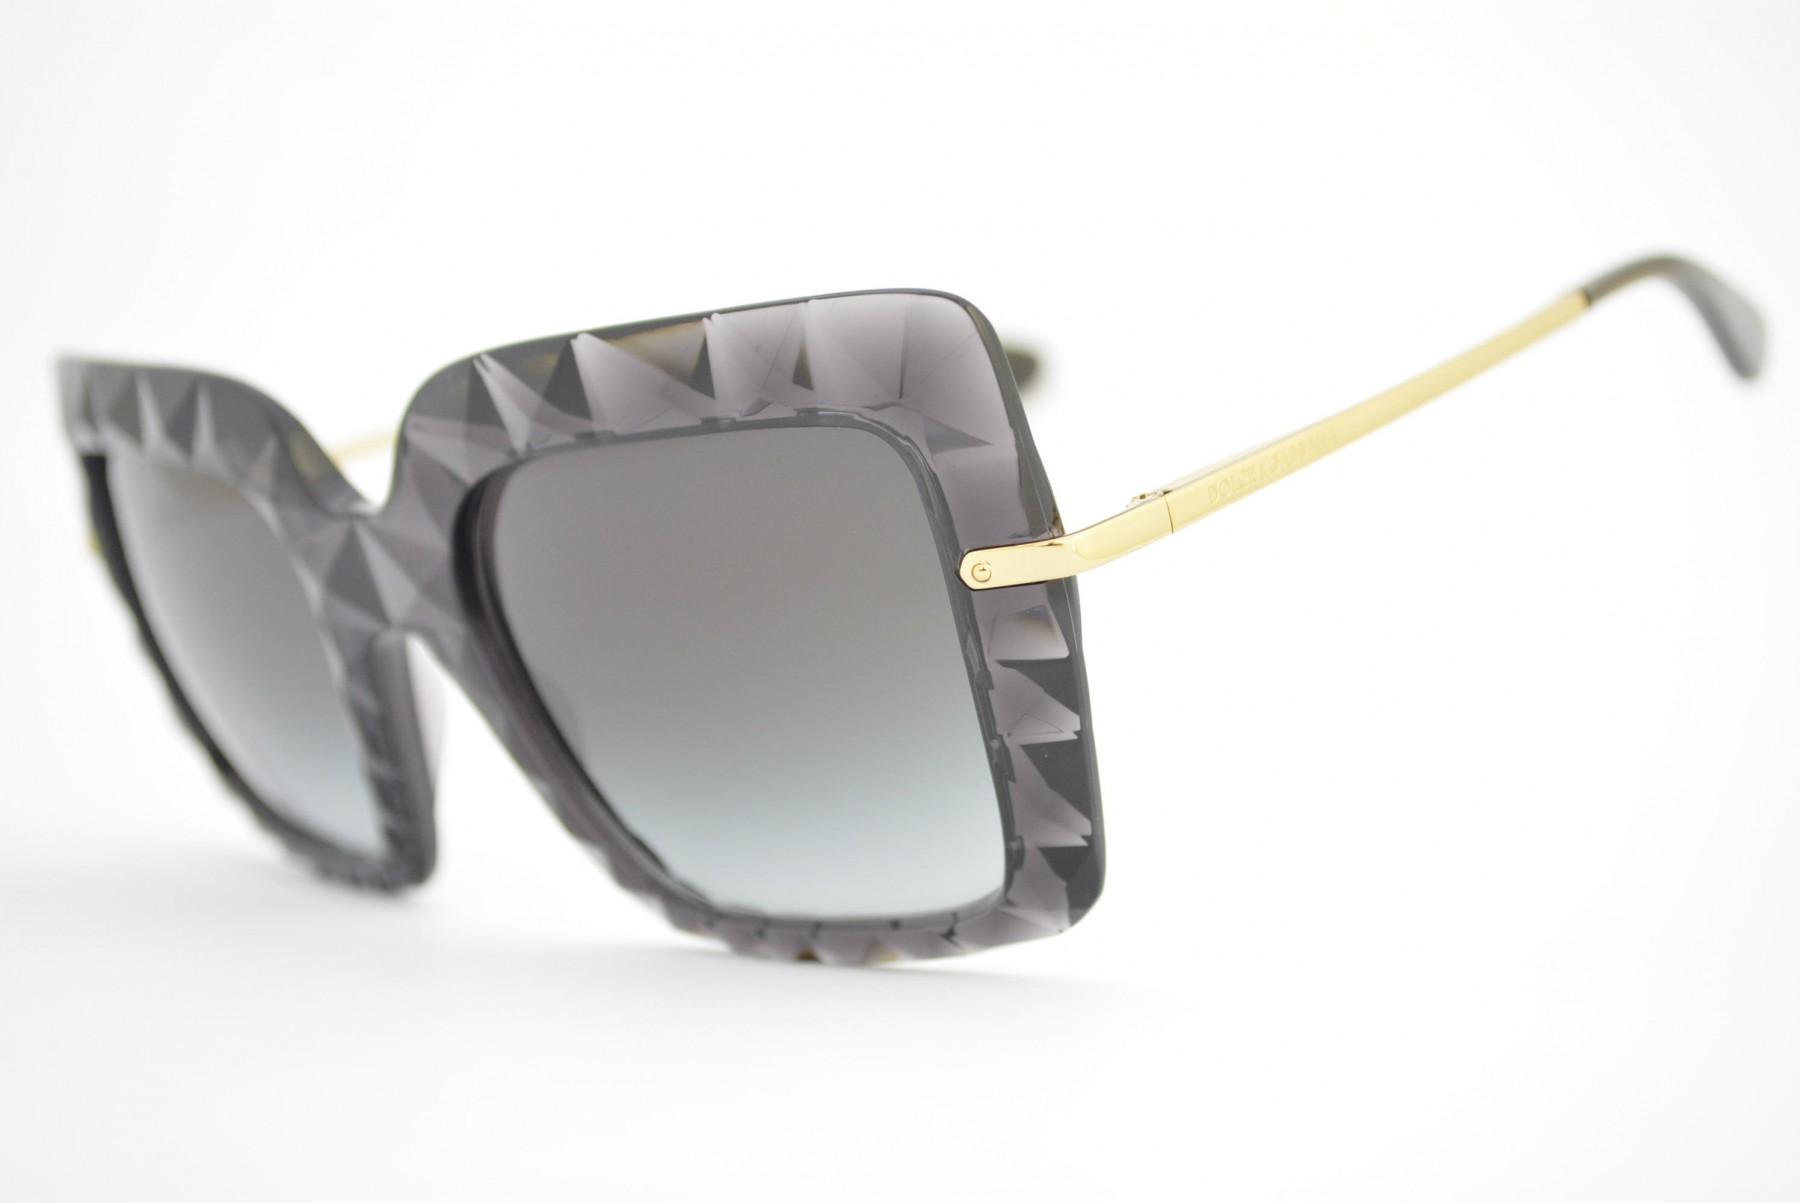 02f1c6afc óculos de sol Dolce & Gabbana mod DG6111 504/8g. Código: dg6111 504/8g